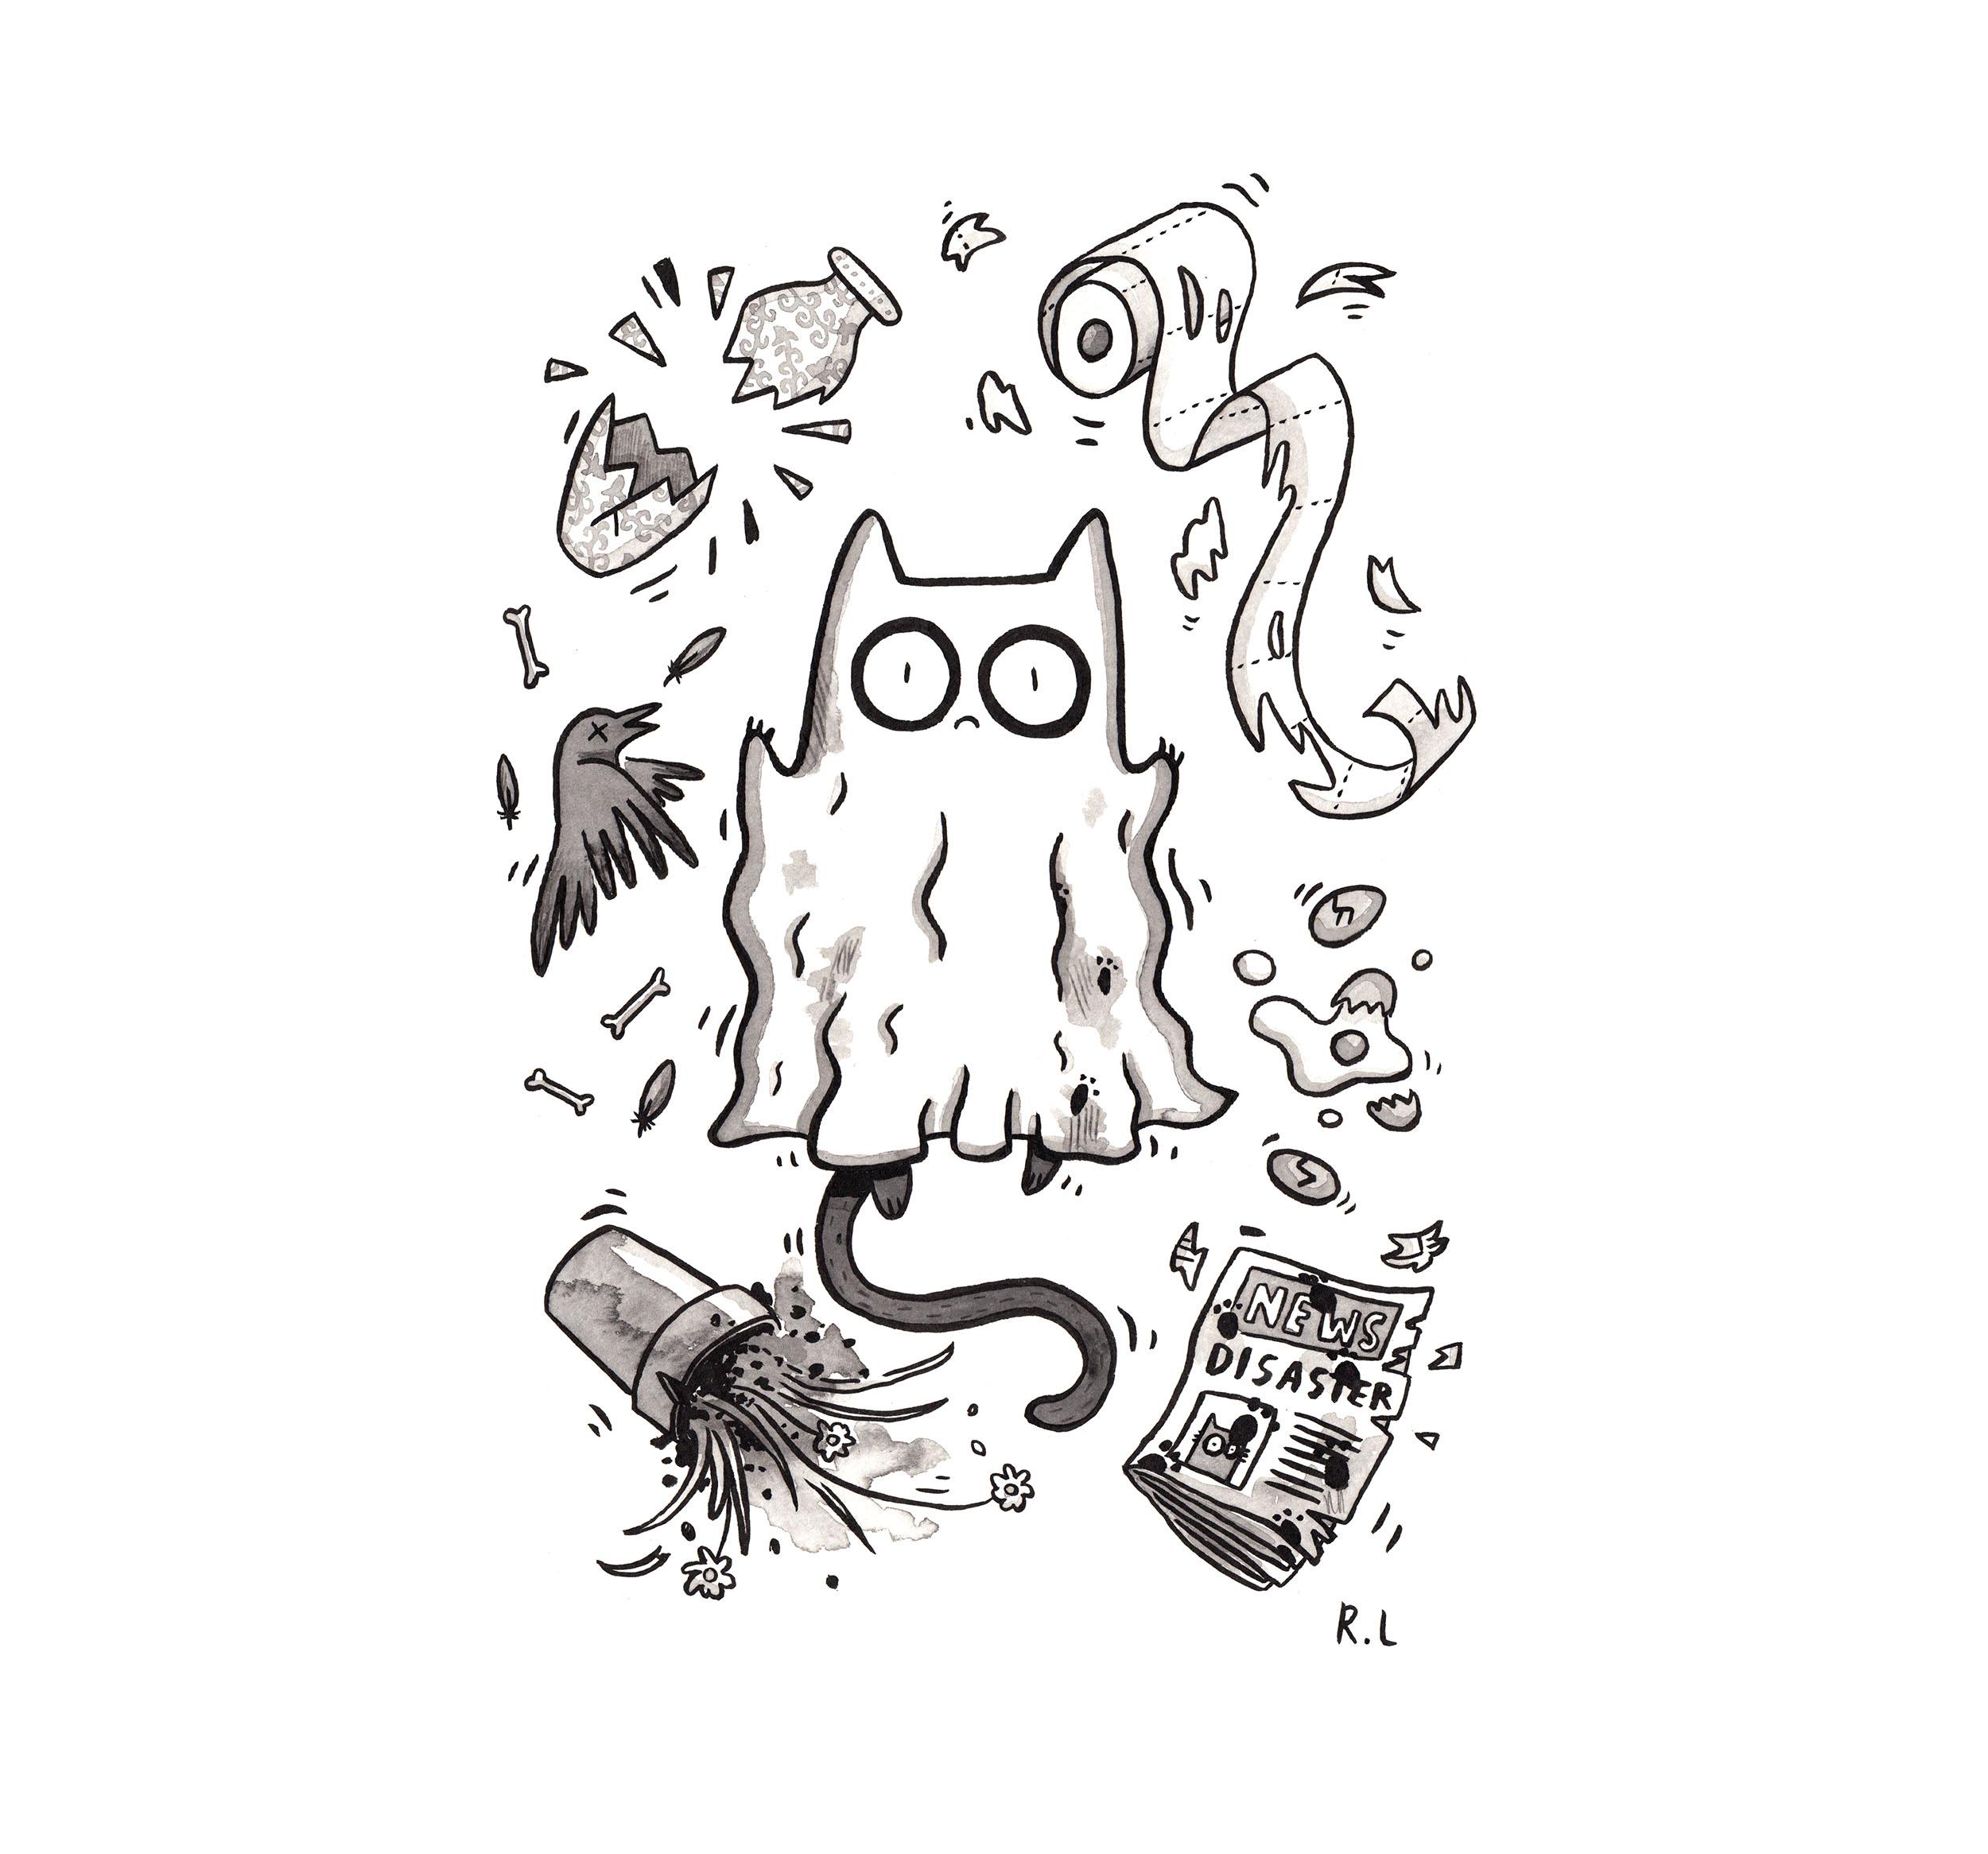 mysterious cat ghost inktober rachel logan illustration.jpg